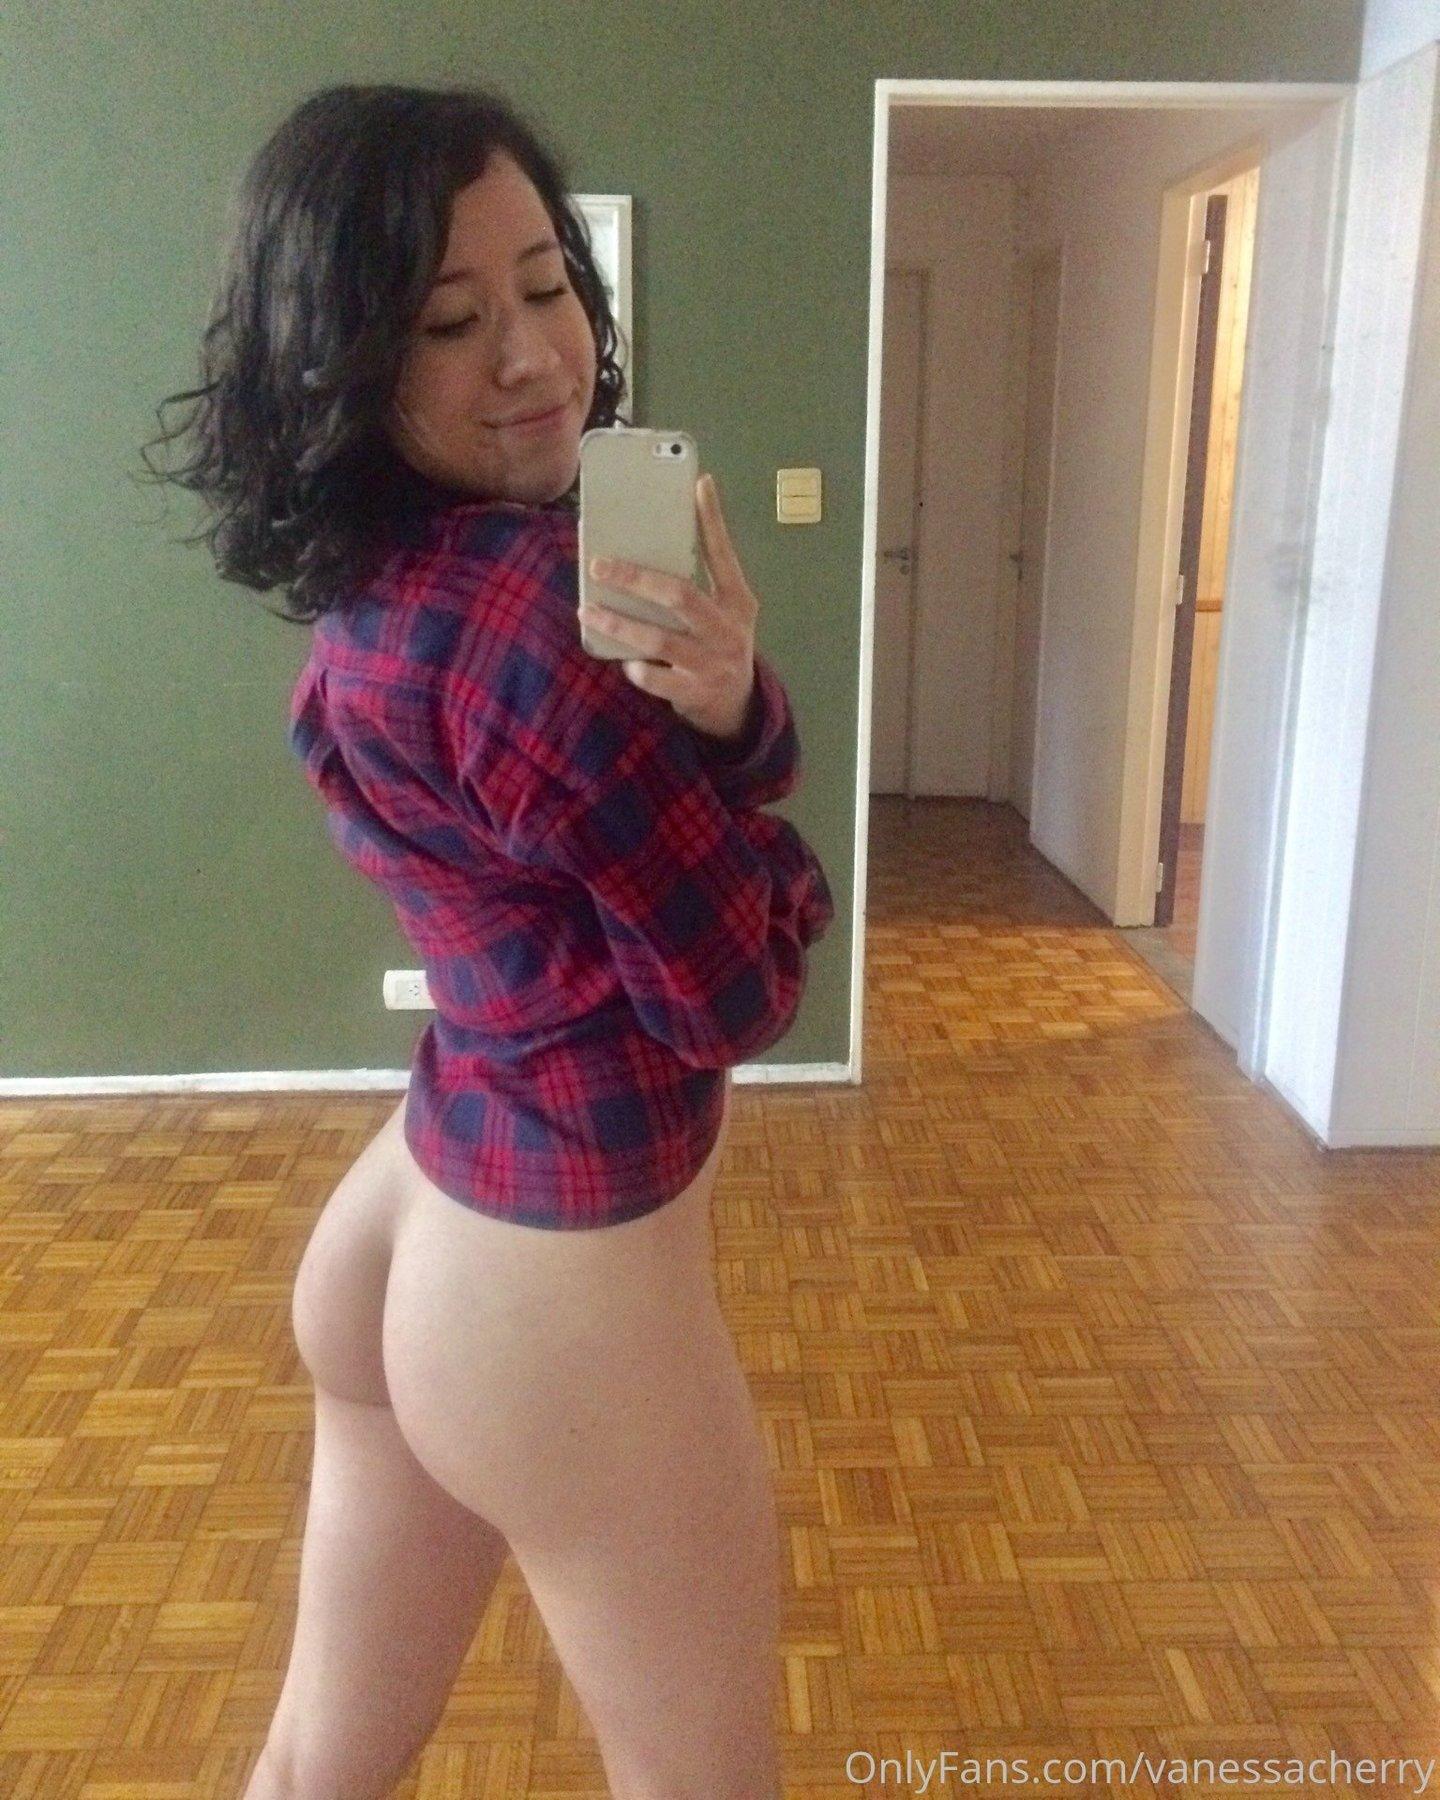 Vanessacherry Onlyfans Nude Leaks 0005